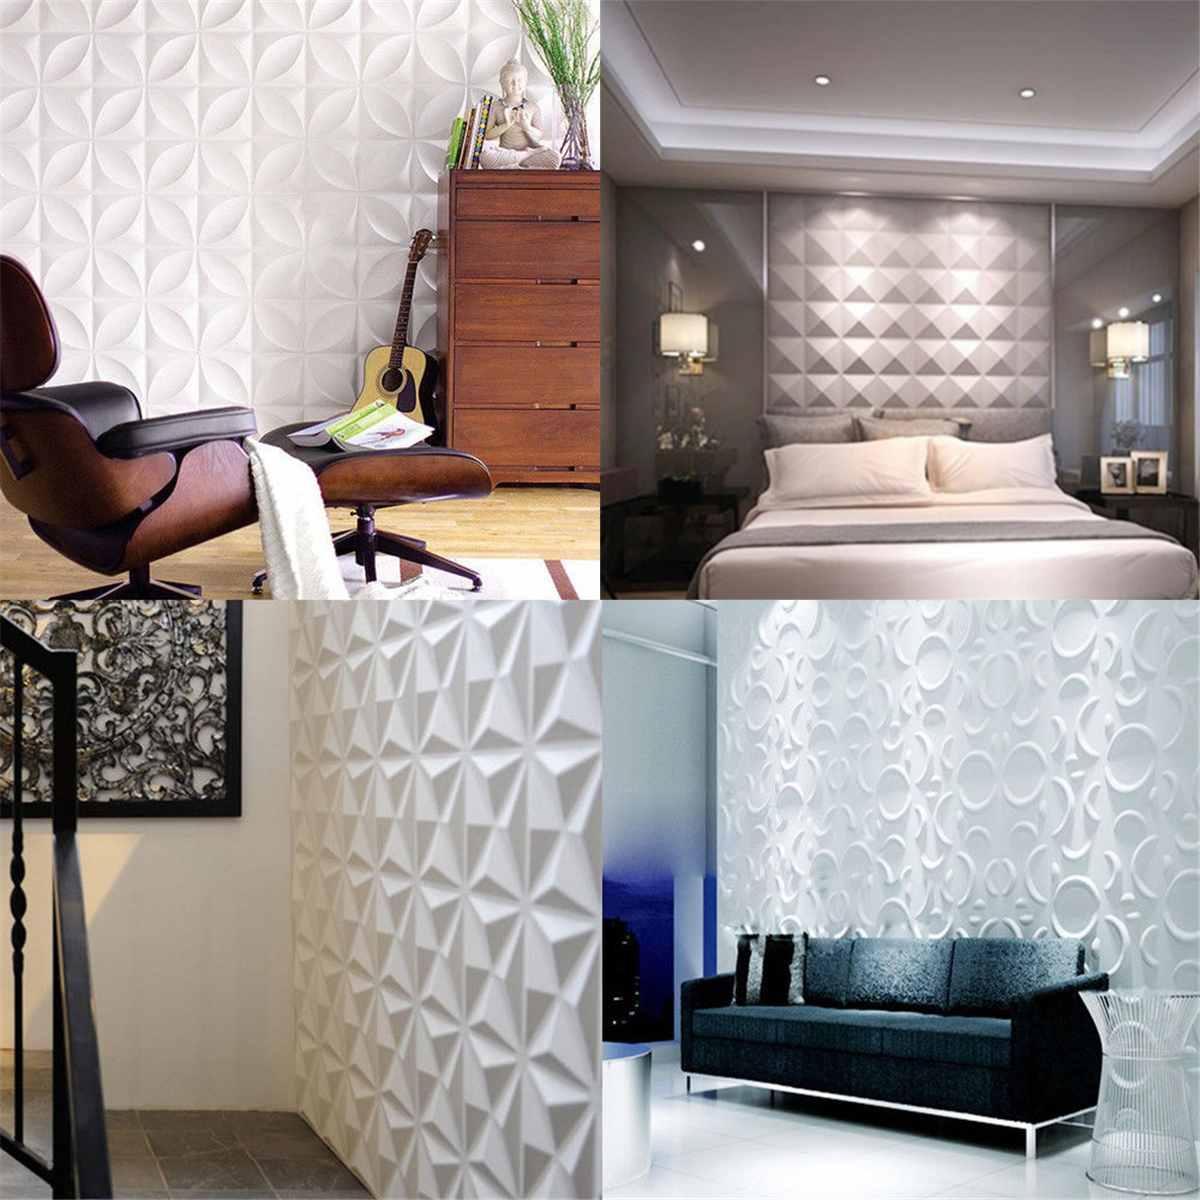 12Pcs/Set 3D Wall Panel Ceiling Tiles Wallpaper Geometric Art Stickers TV Background Home Living Room Decoration Wall Treatment